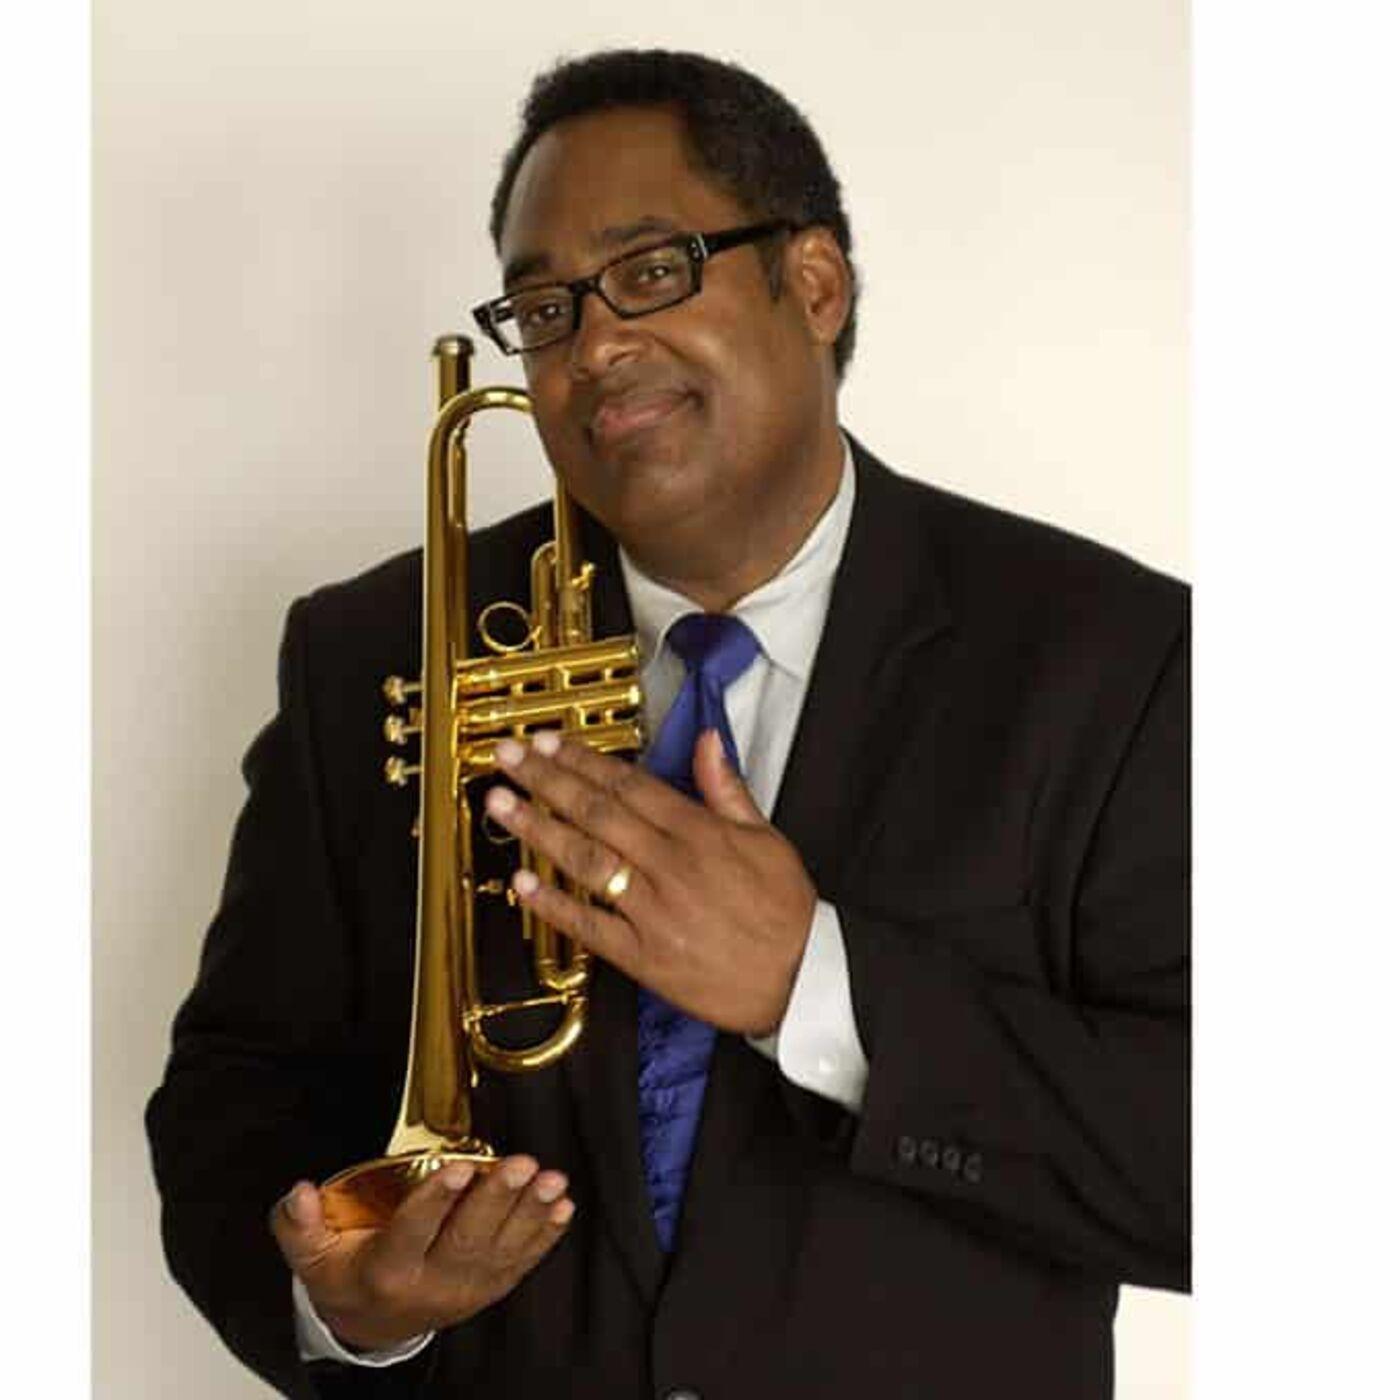 Episode 10 - A Conversation with trumpet virtuoso and educator Jon Faddis.